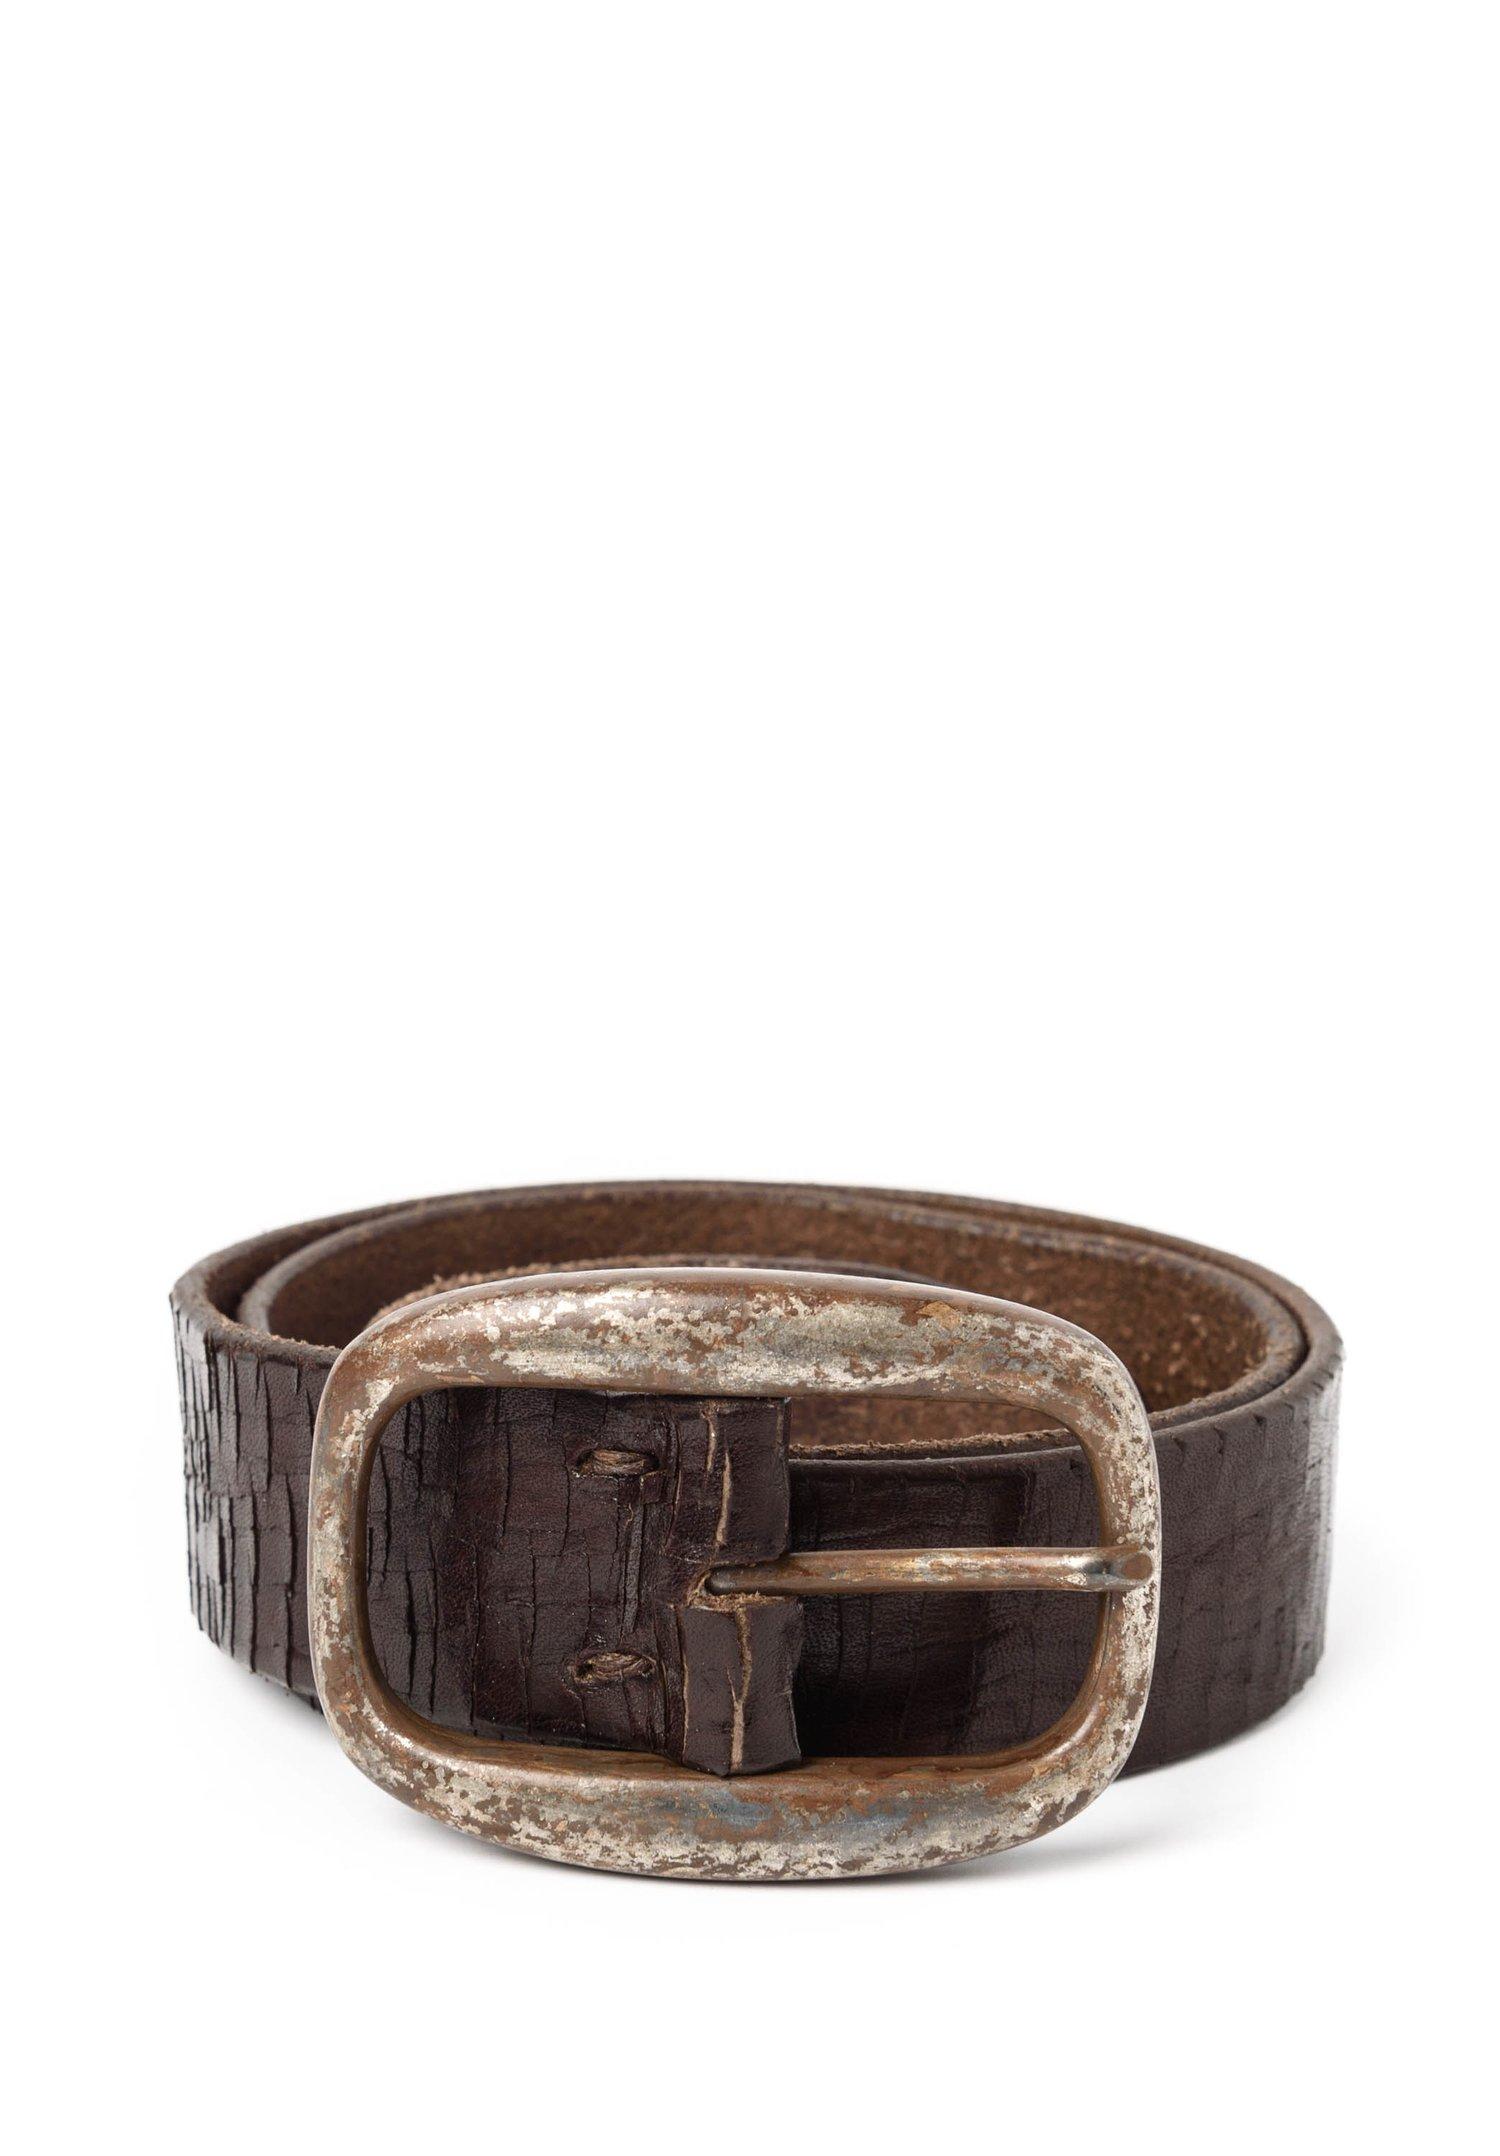 riccardo forconi scored leather belt in brown santa